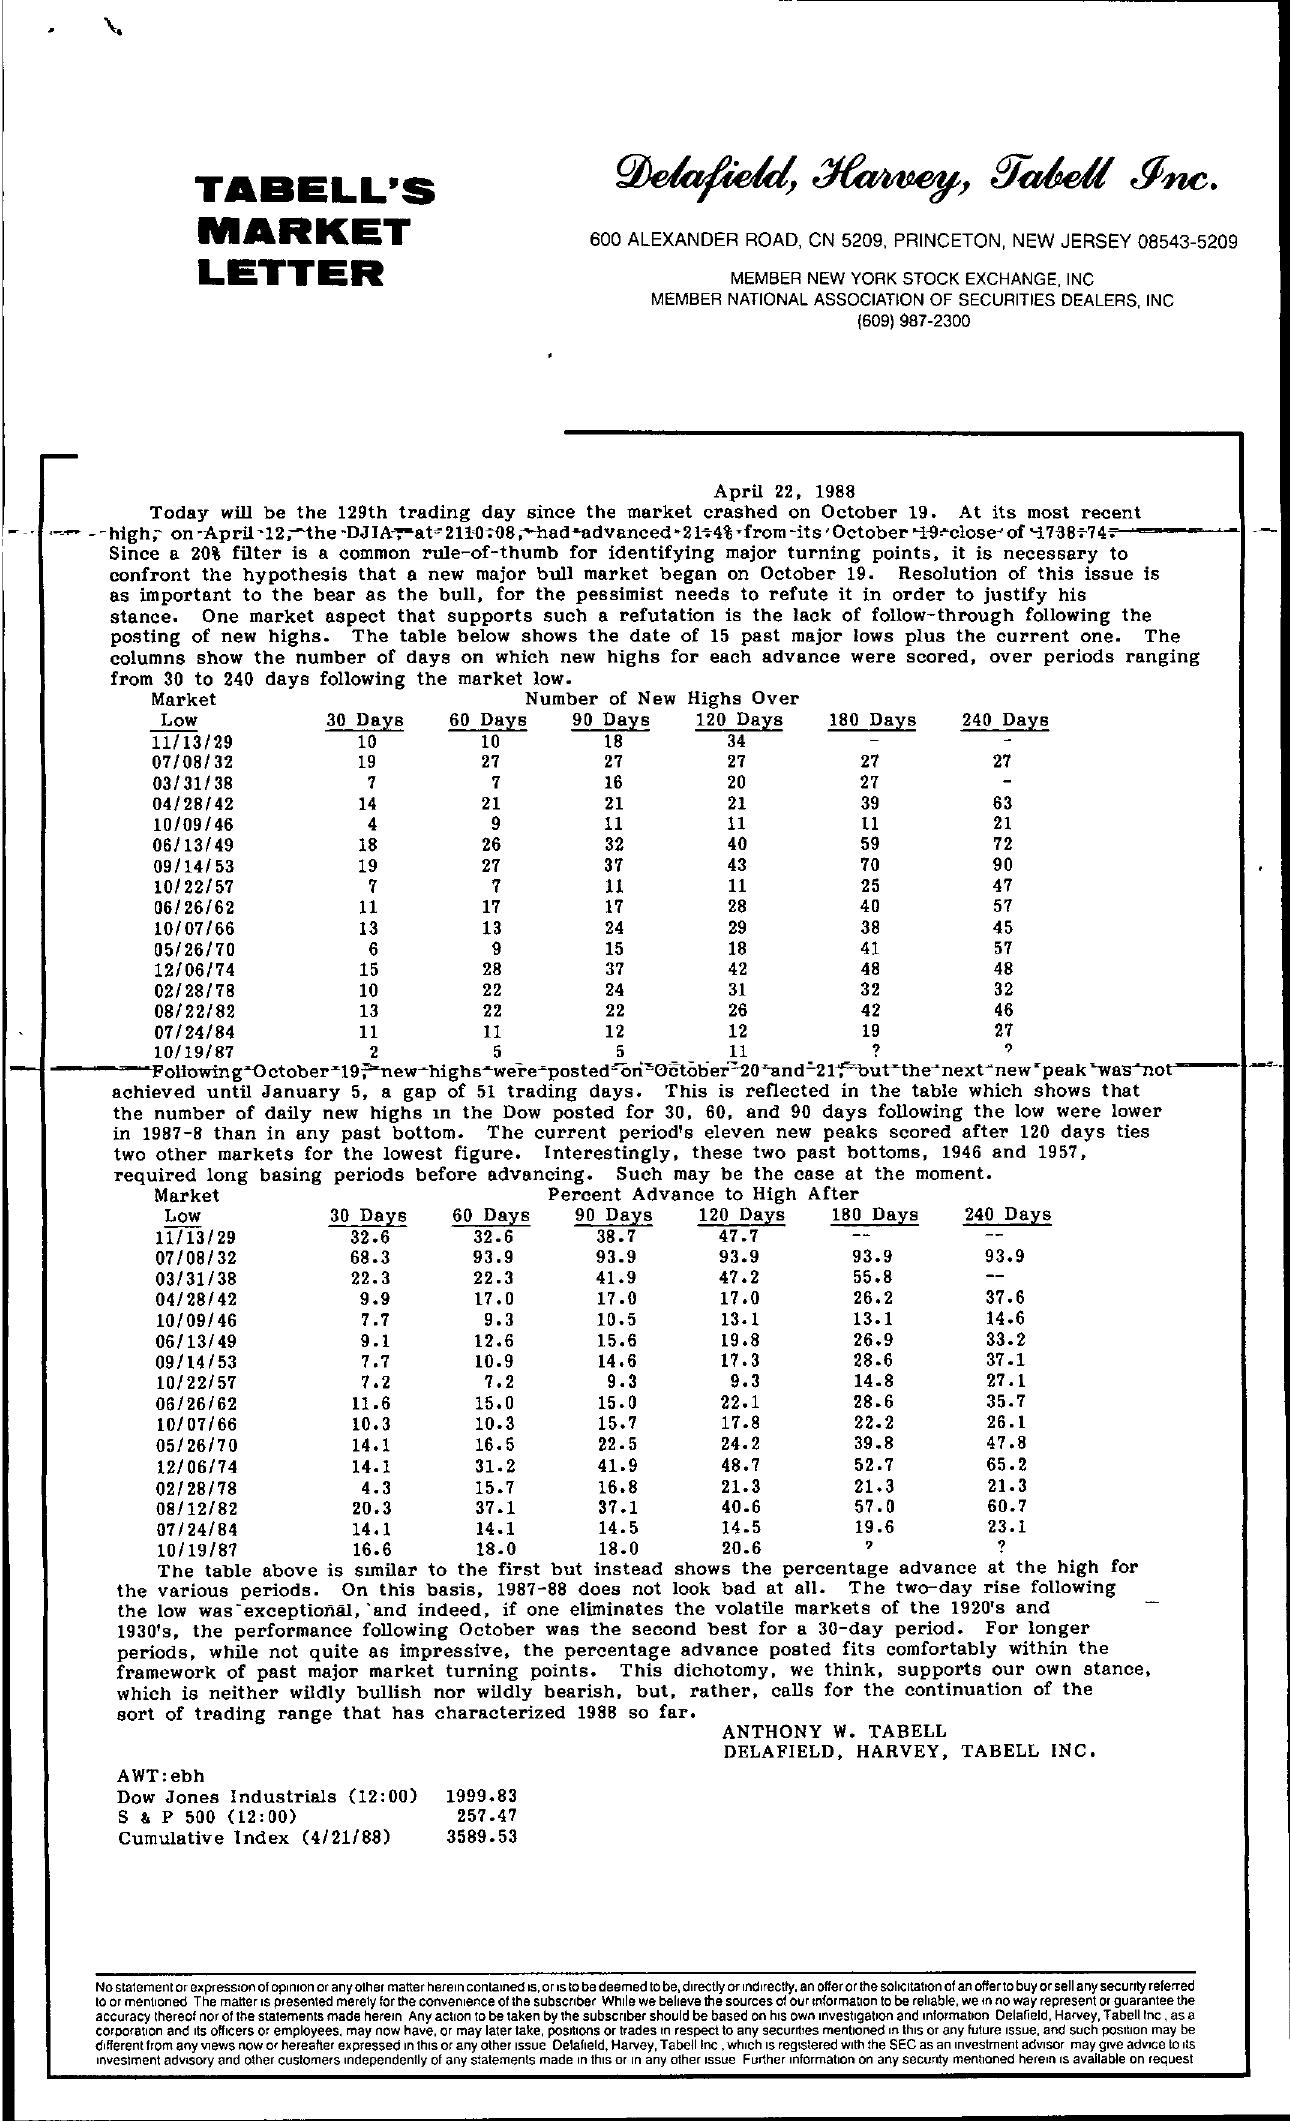 Tabell's Market Letter - April 22, 1988